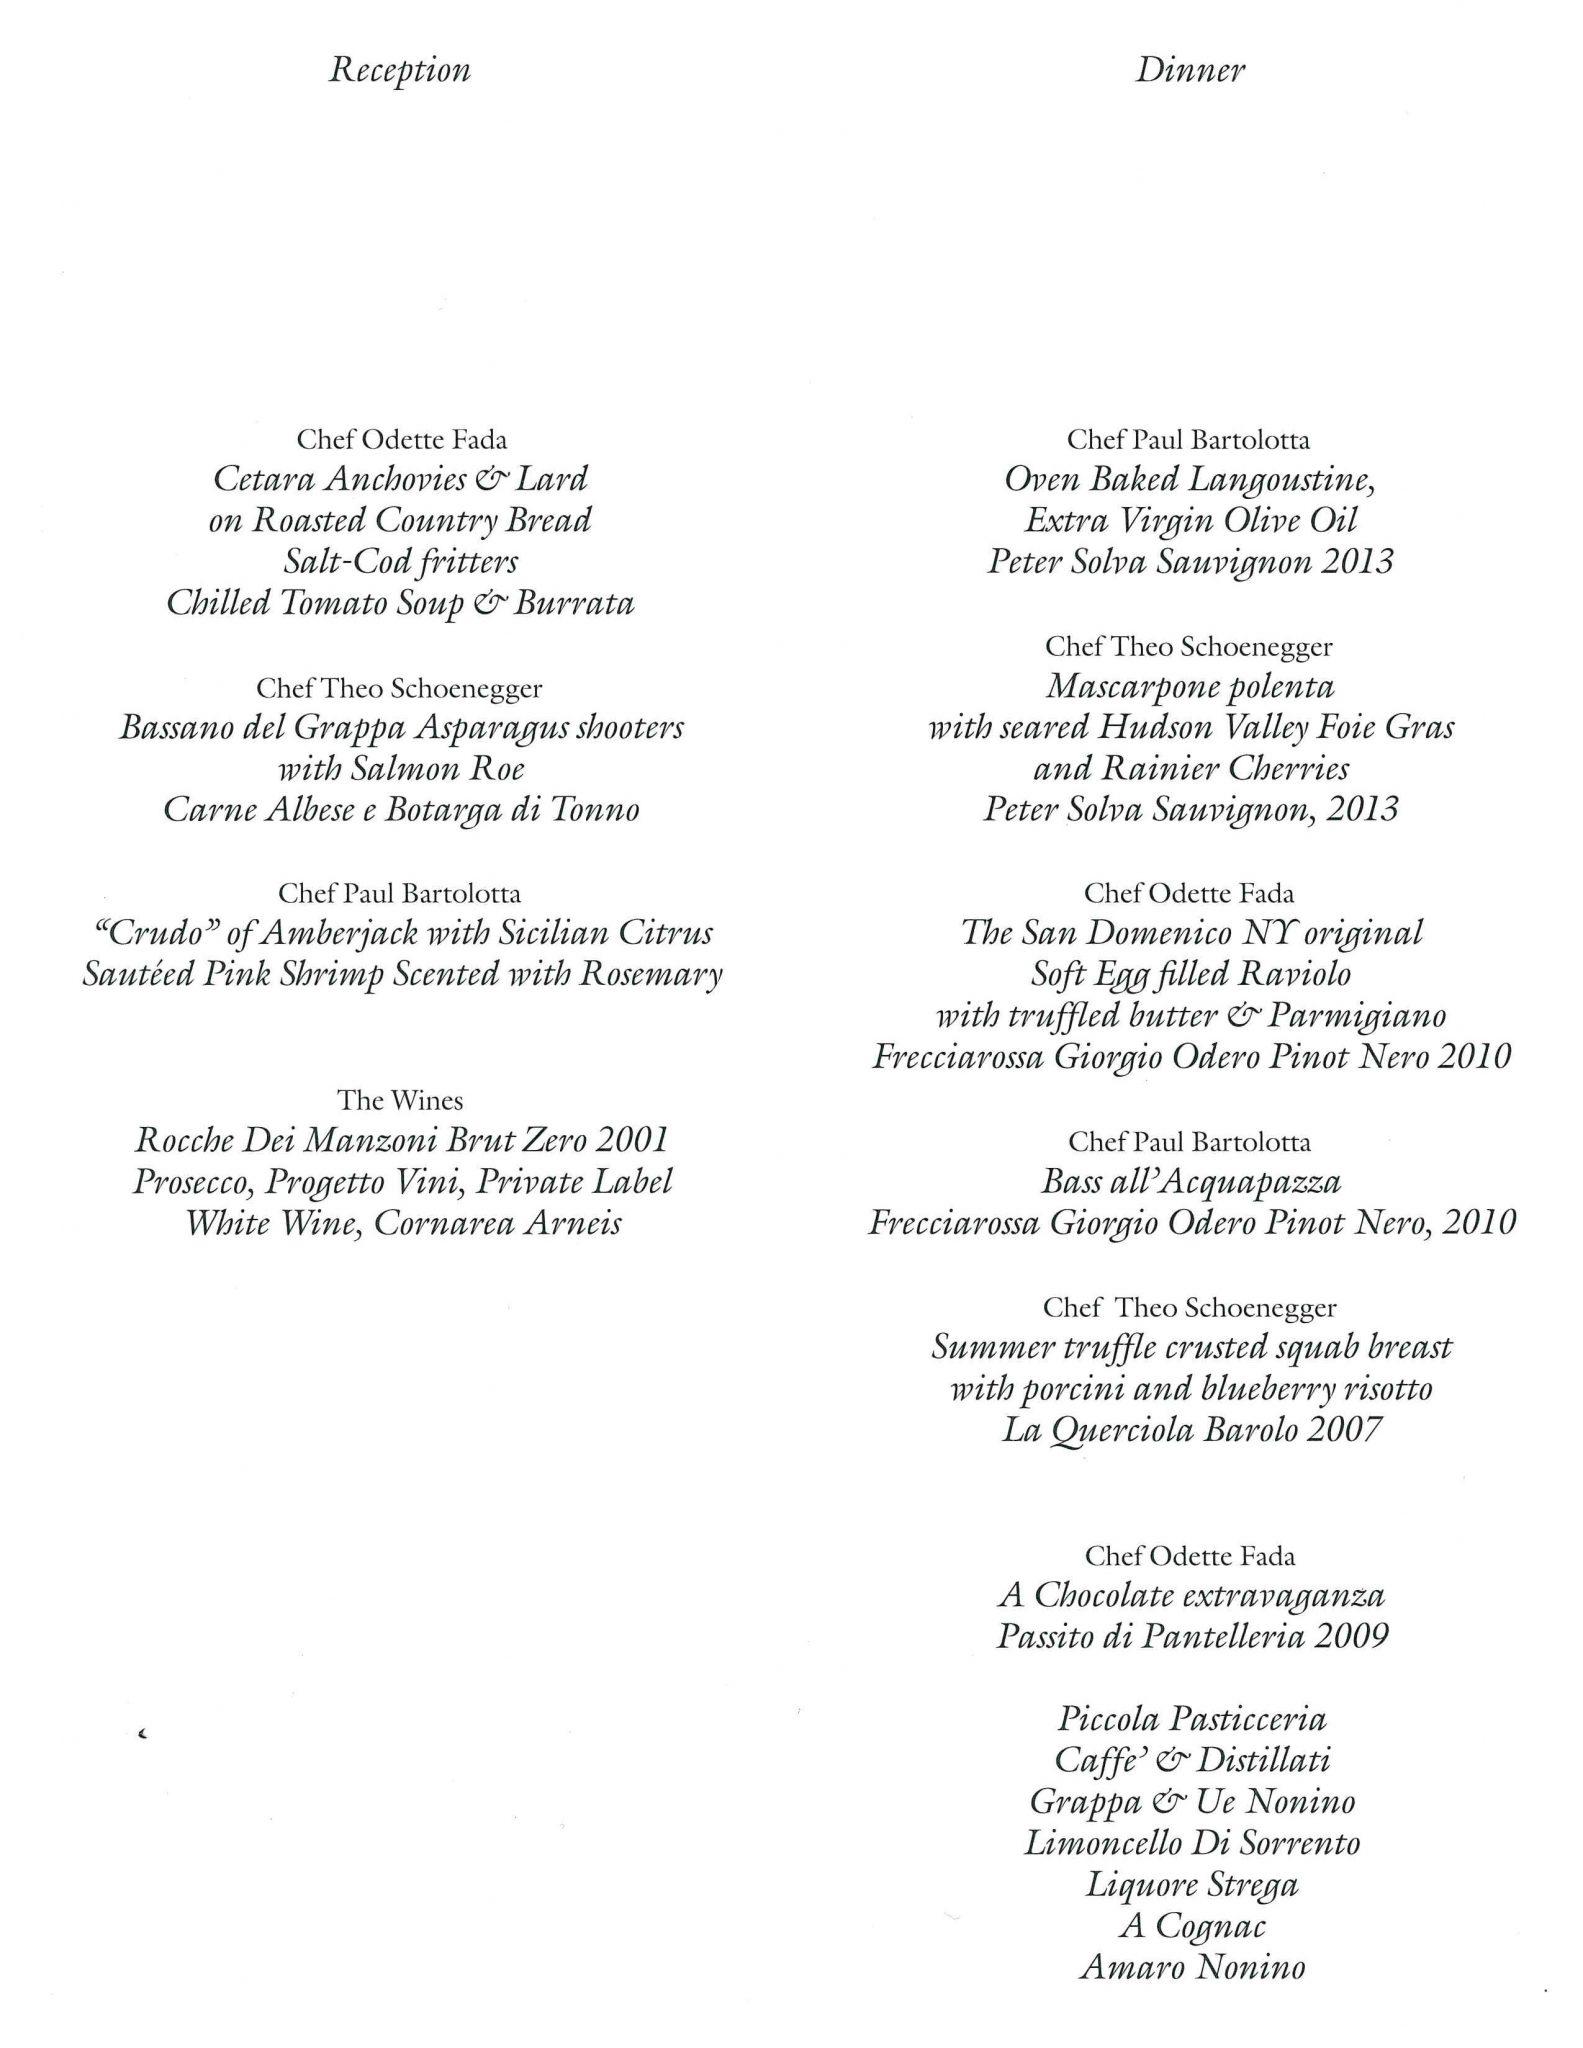 The Italian Culinary Foundation